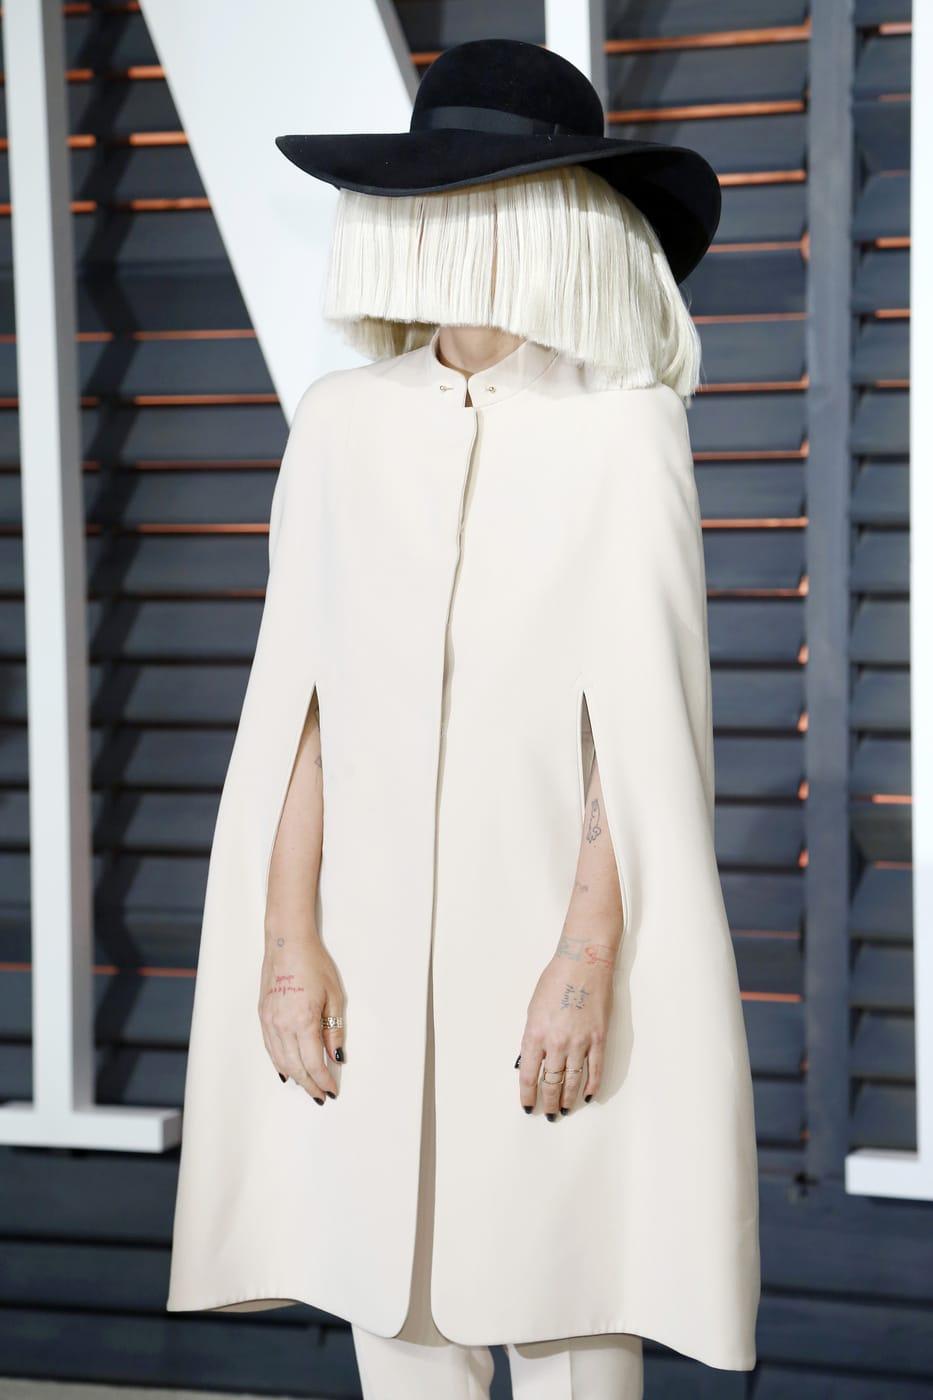 Sia in a cream colored cape coat and black hat